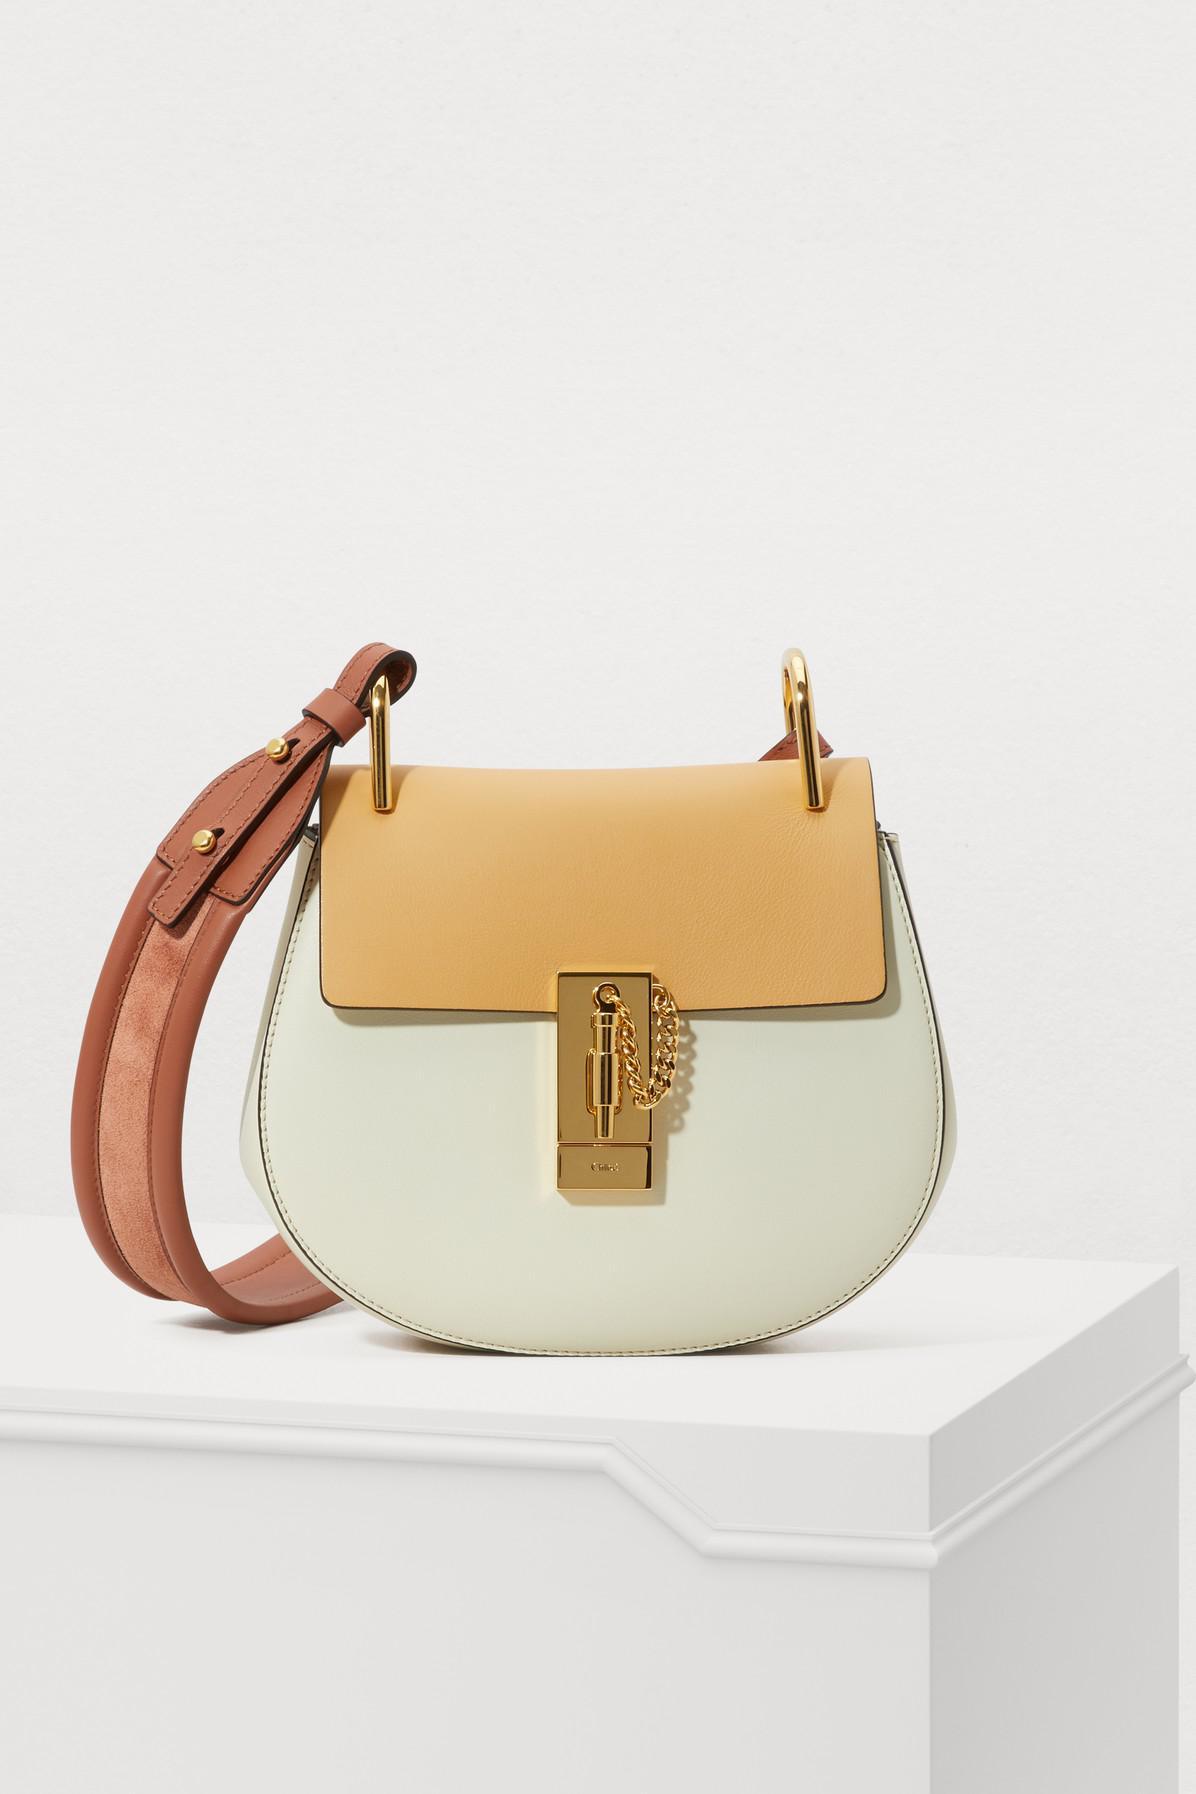 cc7837fb95c72 Chloé Drew Mini Shoulder Bag in Brown - Lyst